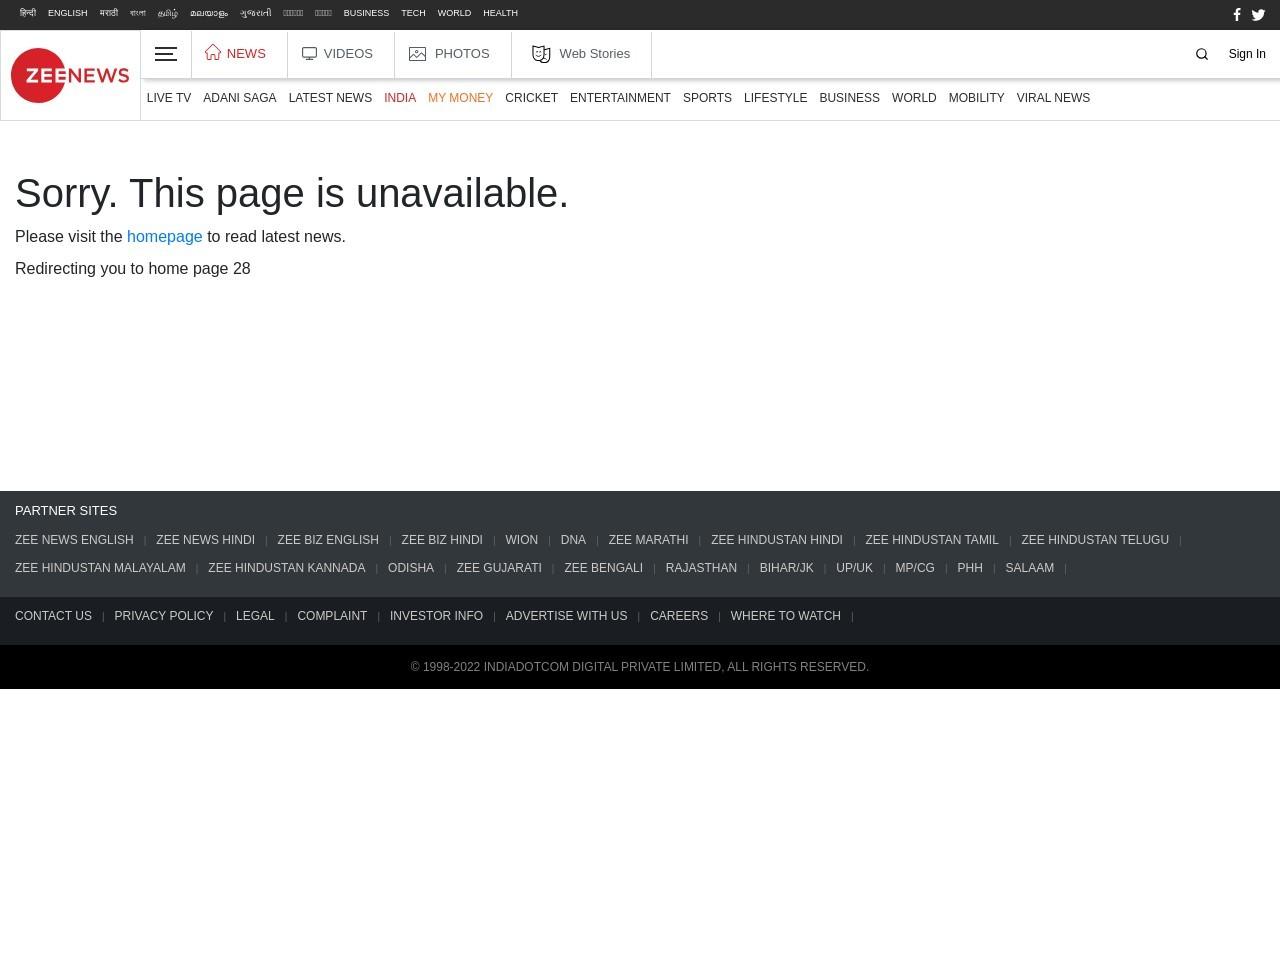 PSL 2017: 'Pakistan wins today' as final between Peshawar Zalmi, Quetta Gladiators passes off peacefully